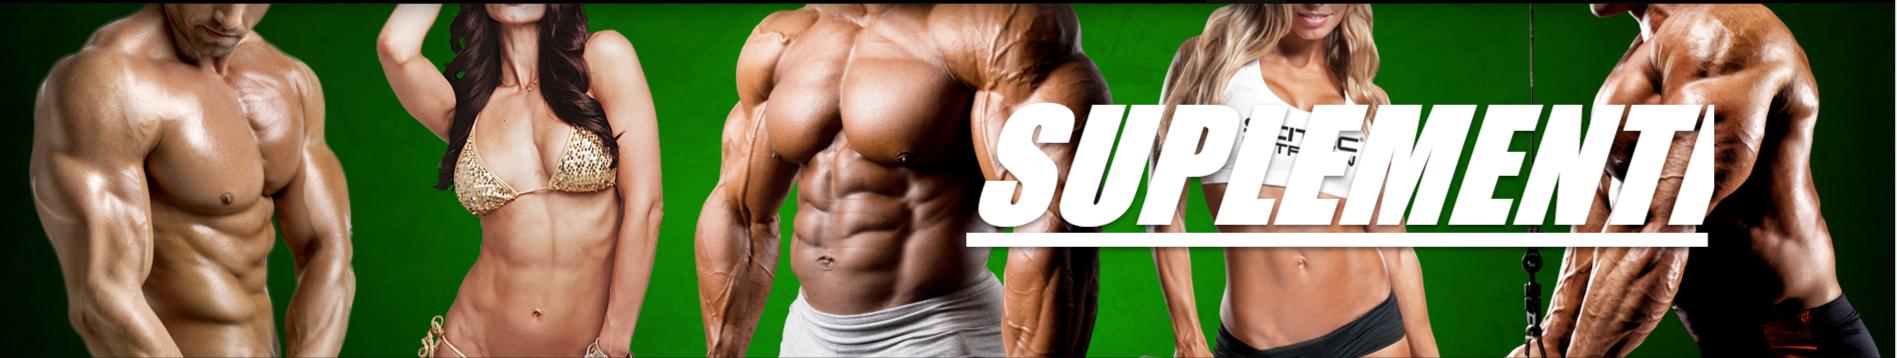 Proteini, sportski preparati, suplementi.